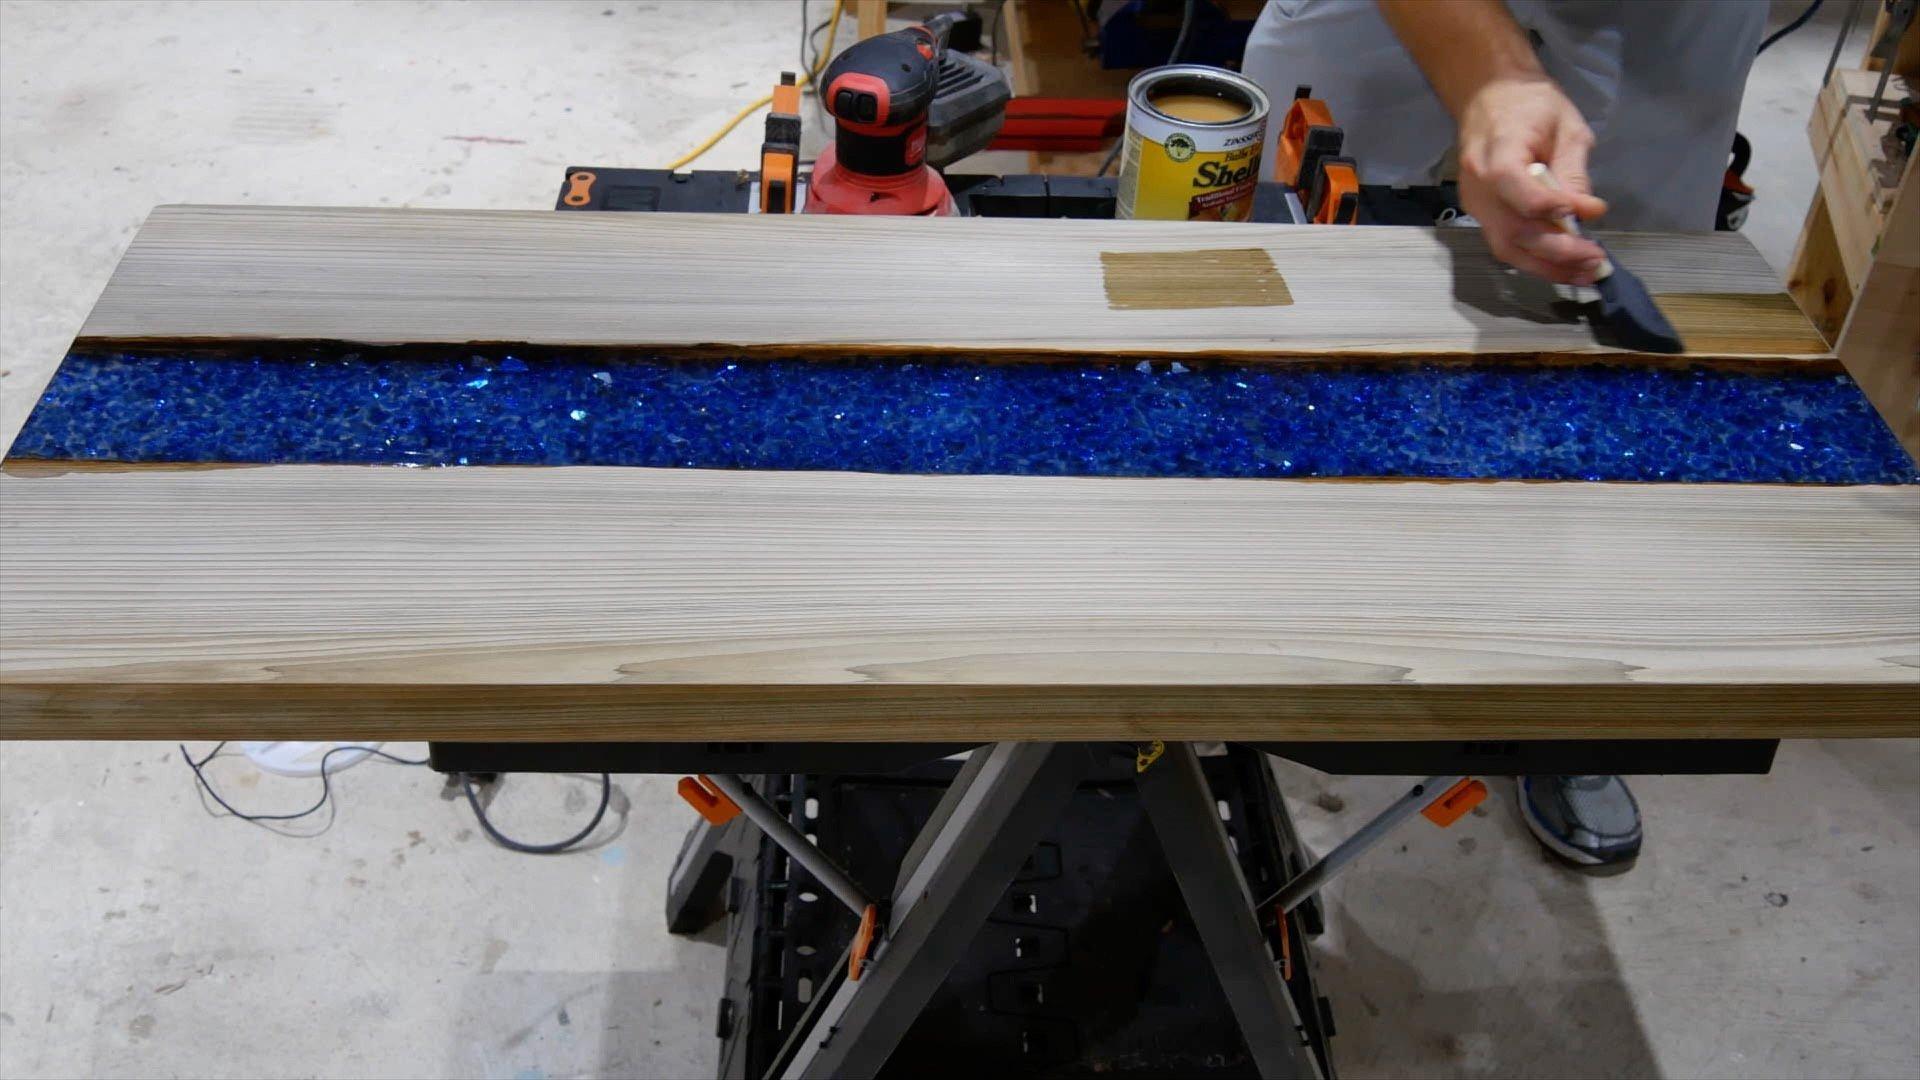 epoxy-resin-river-table-glowpowder_20171016_76